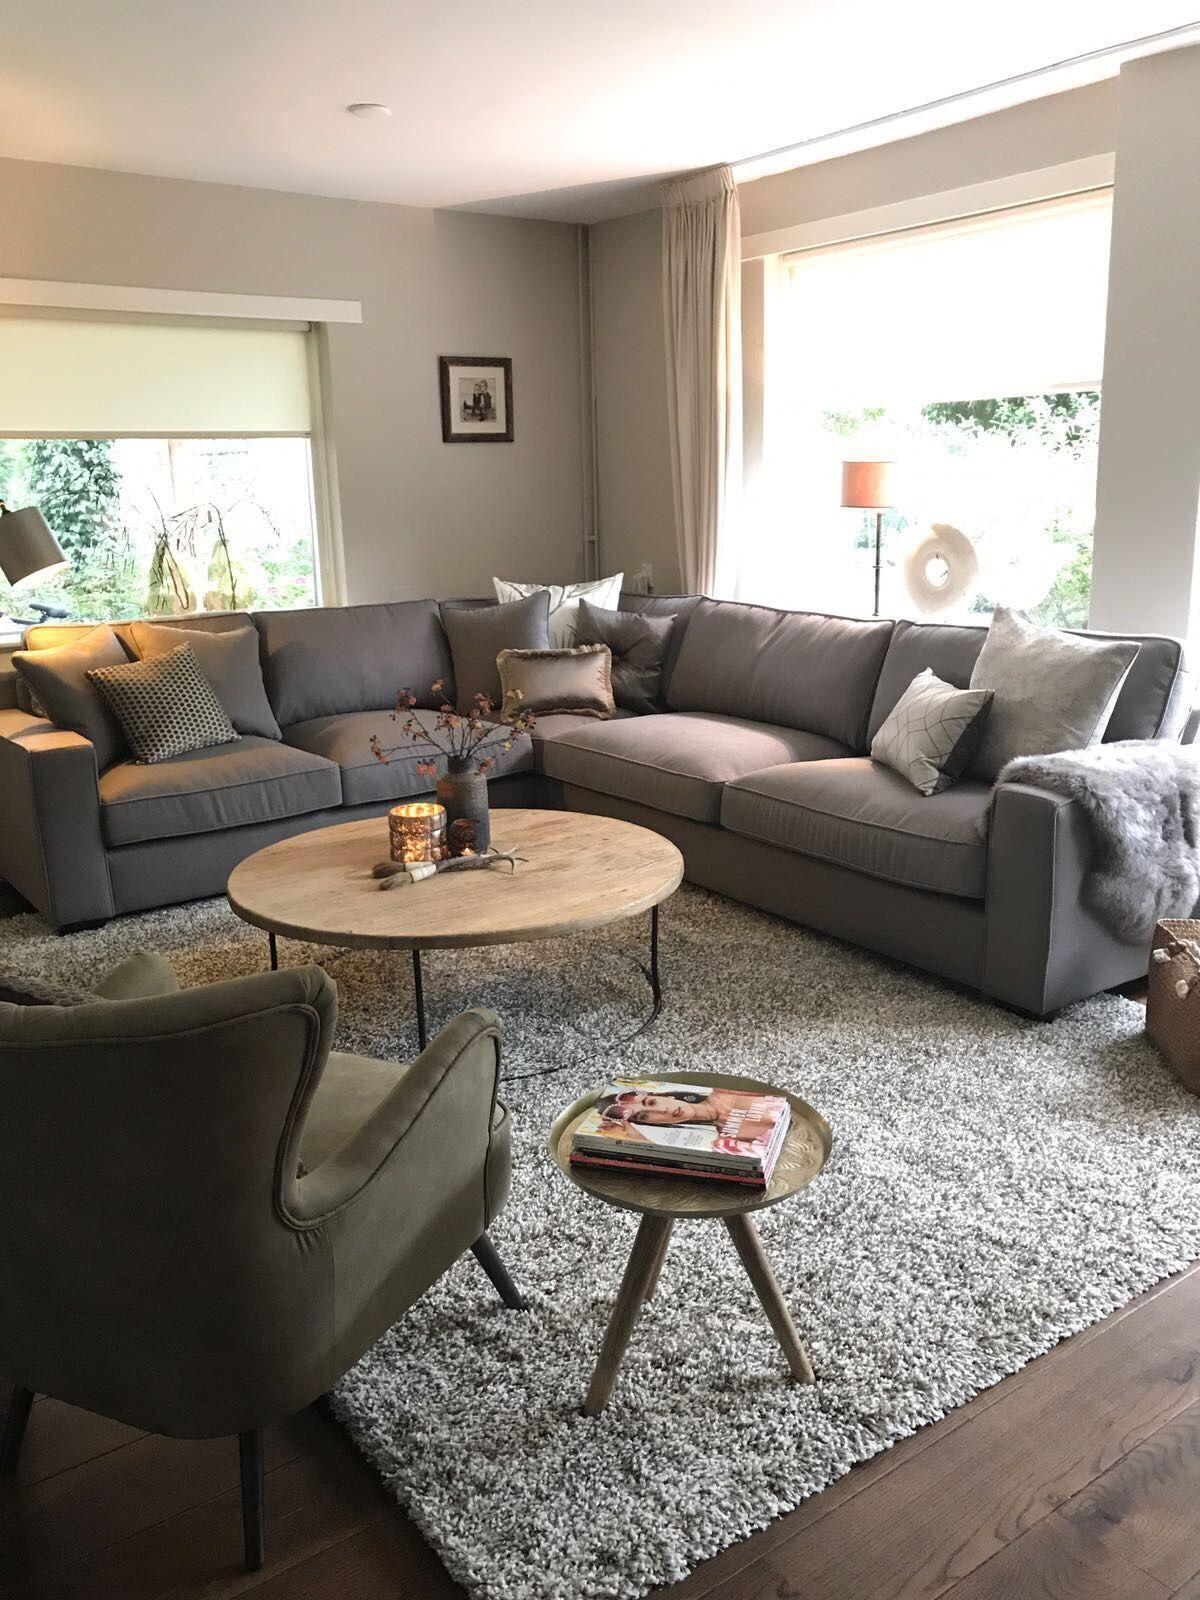 20 Beautiful Sofa Set To Complete Living Room Interior Decor